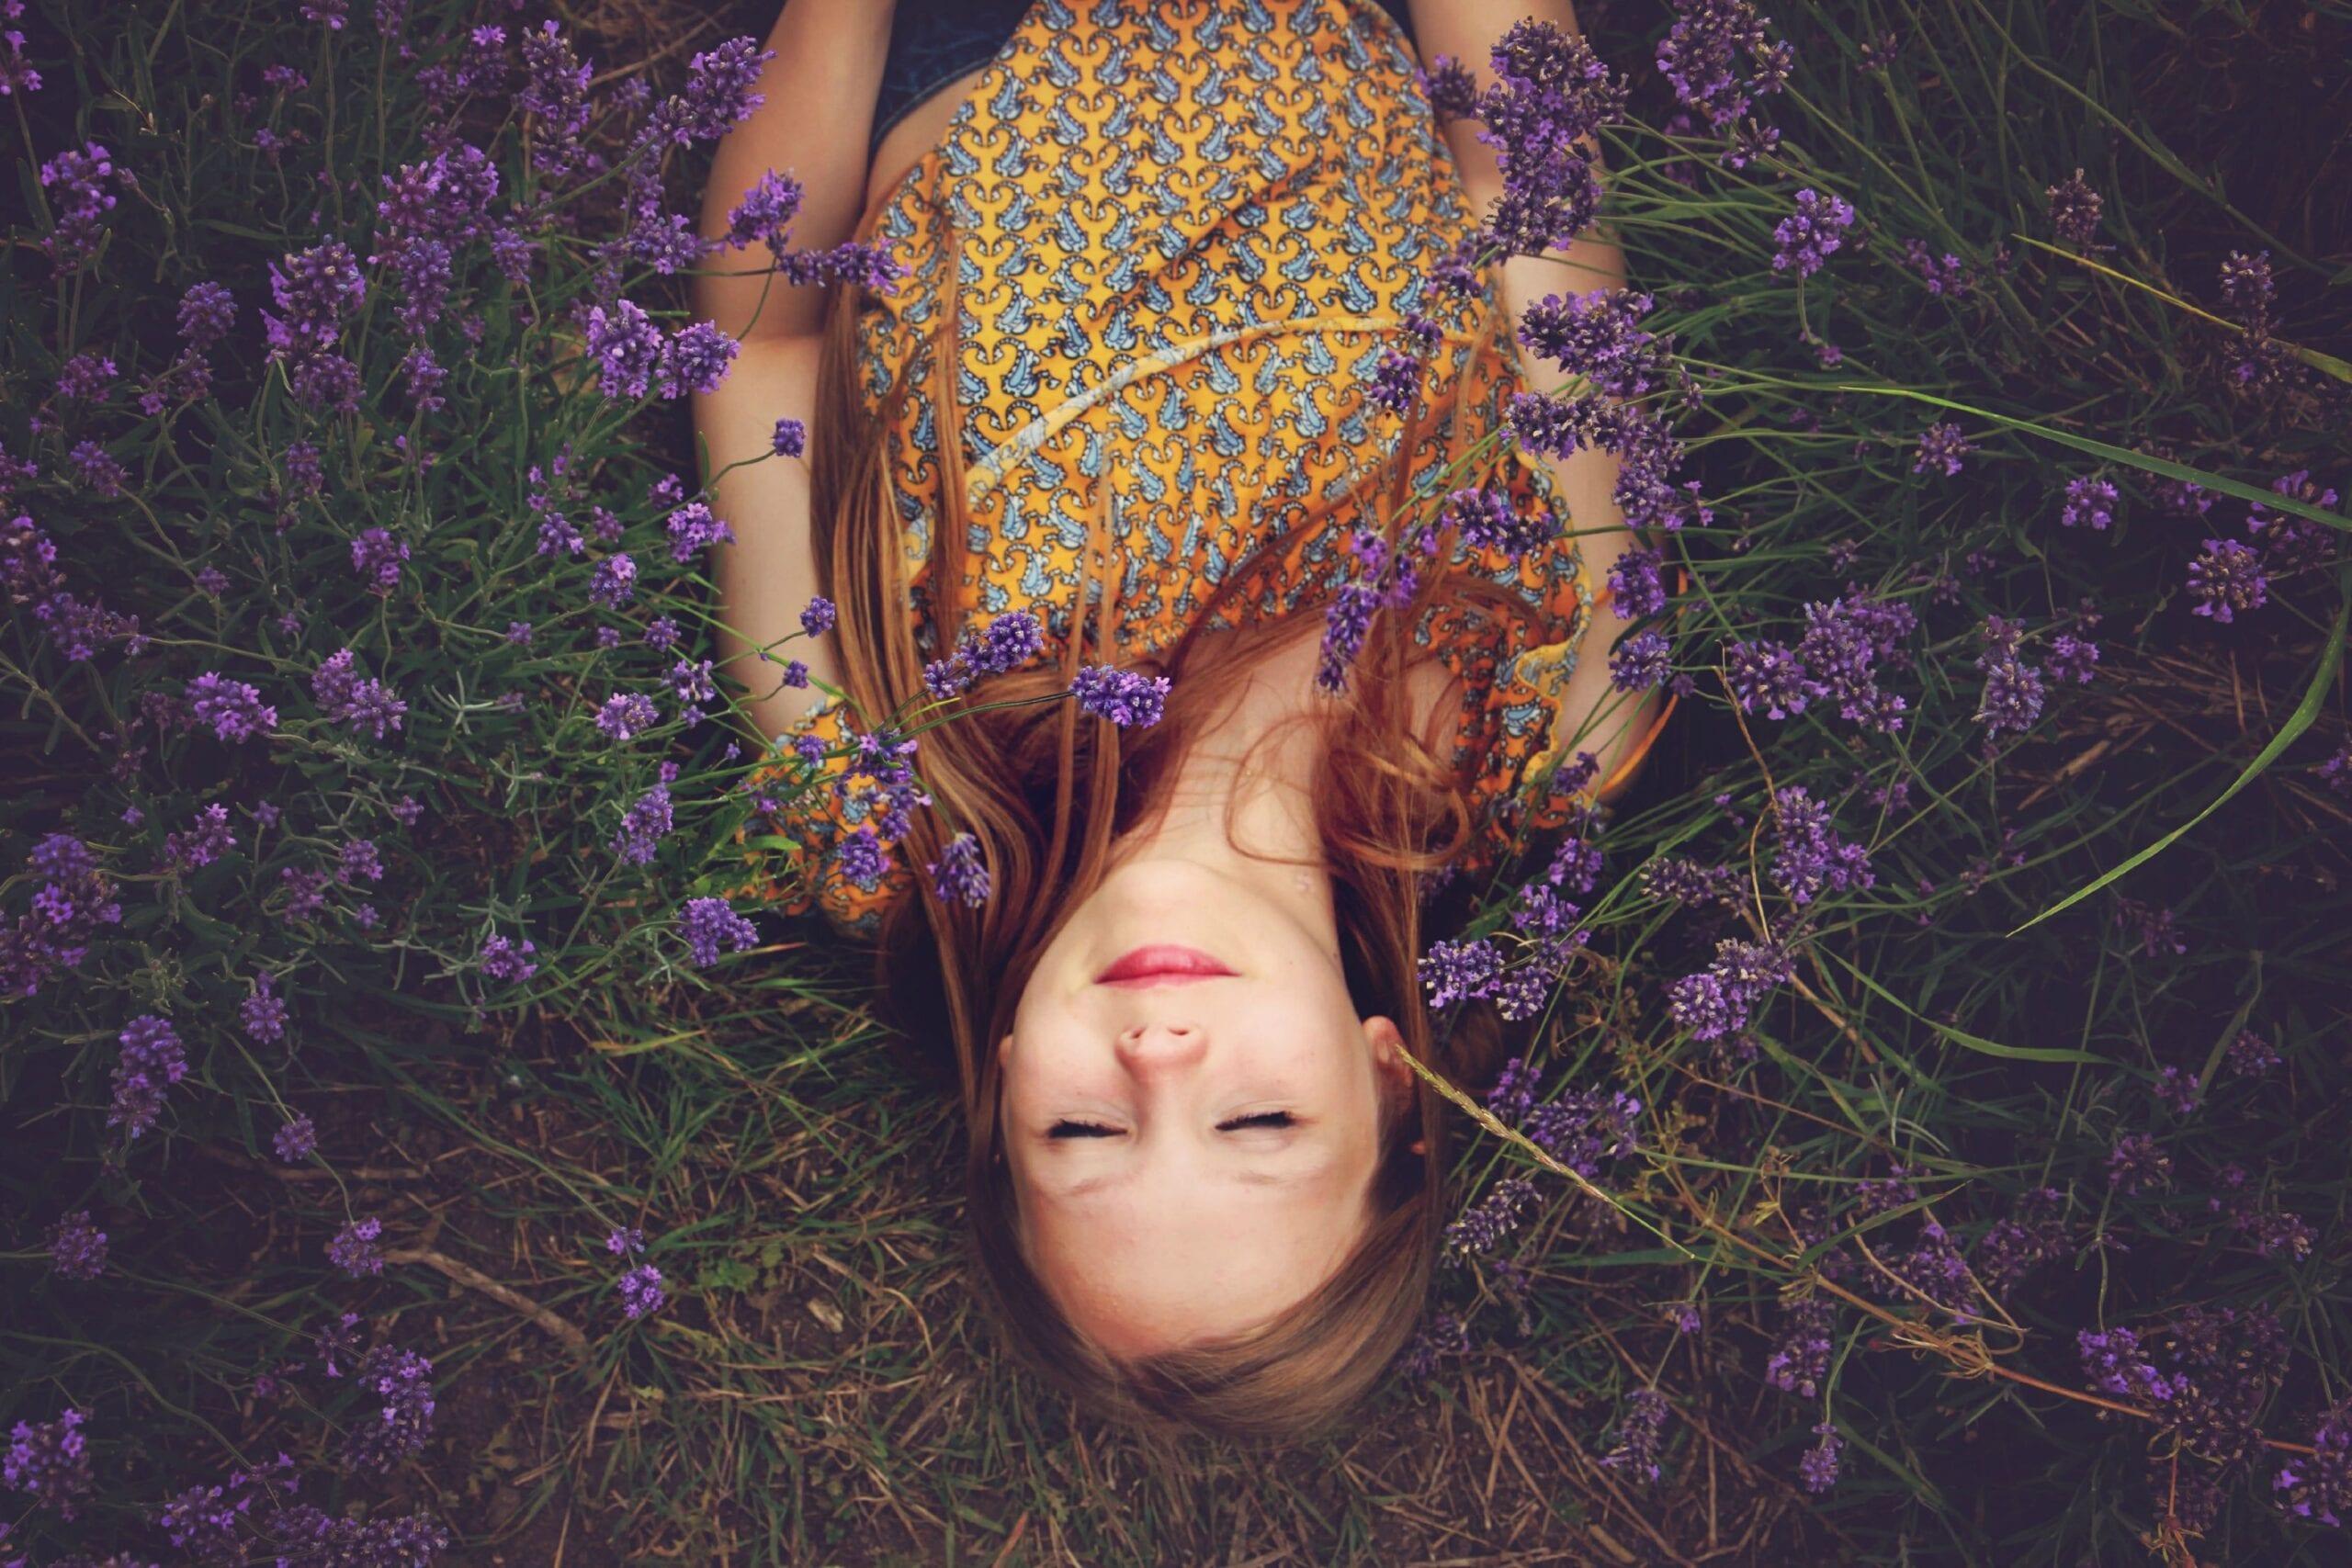 Pranayama: Pust deg gjennom høsten